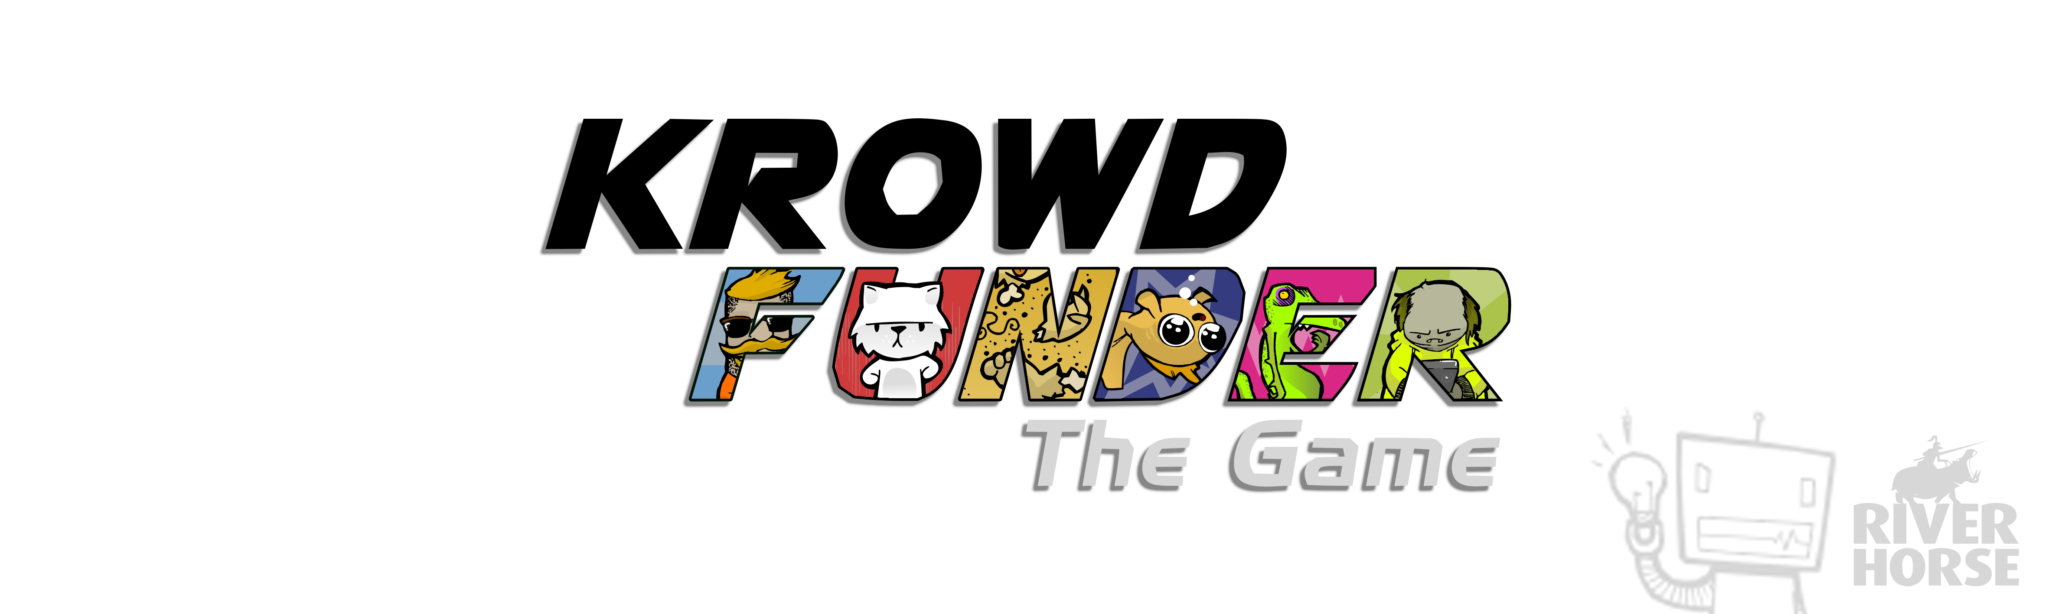 Krowdfunder Title